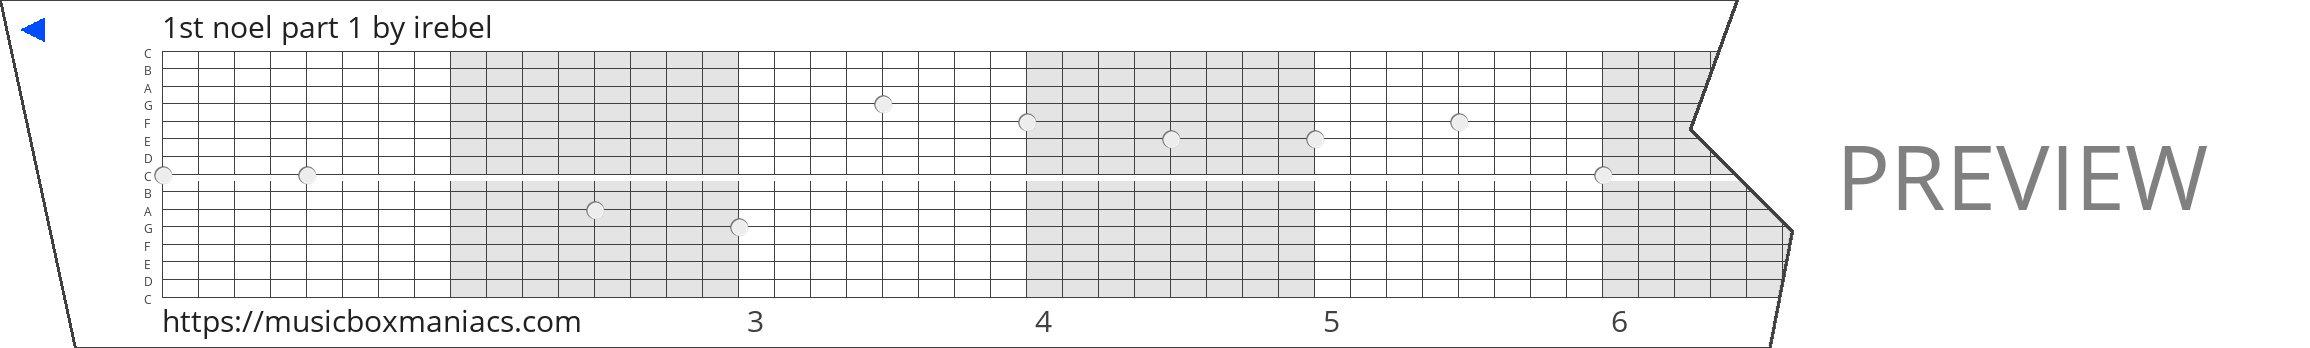 1st noel part 1 15 note music box paper strip